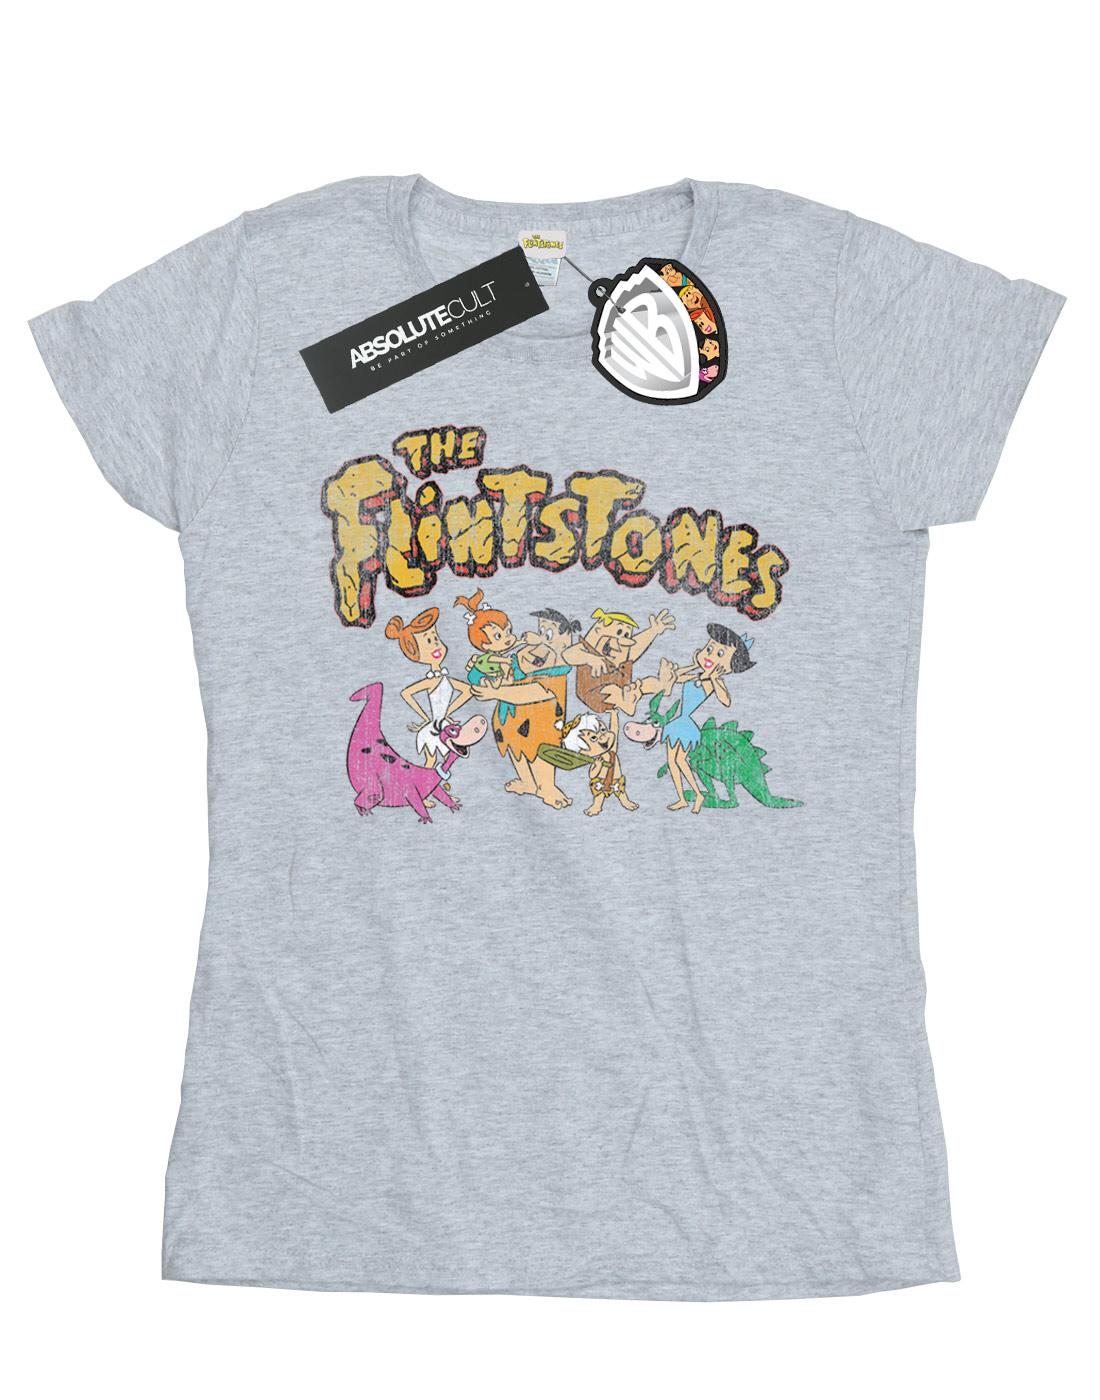 The-Flintstones-Women-039-s-Group-Distressed-T-Shirt thumbnail 12